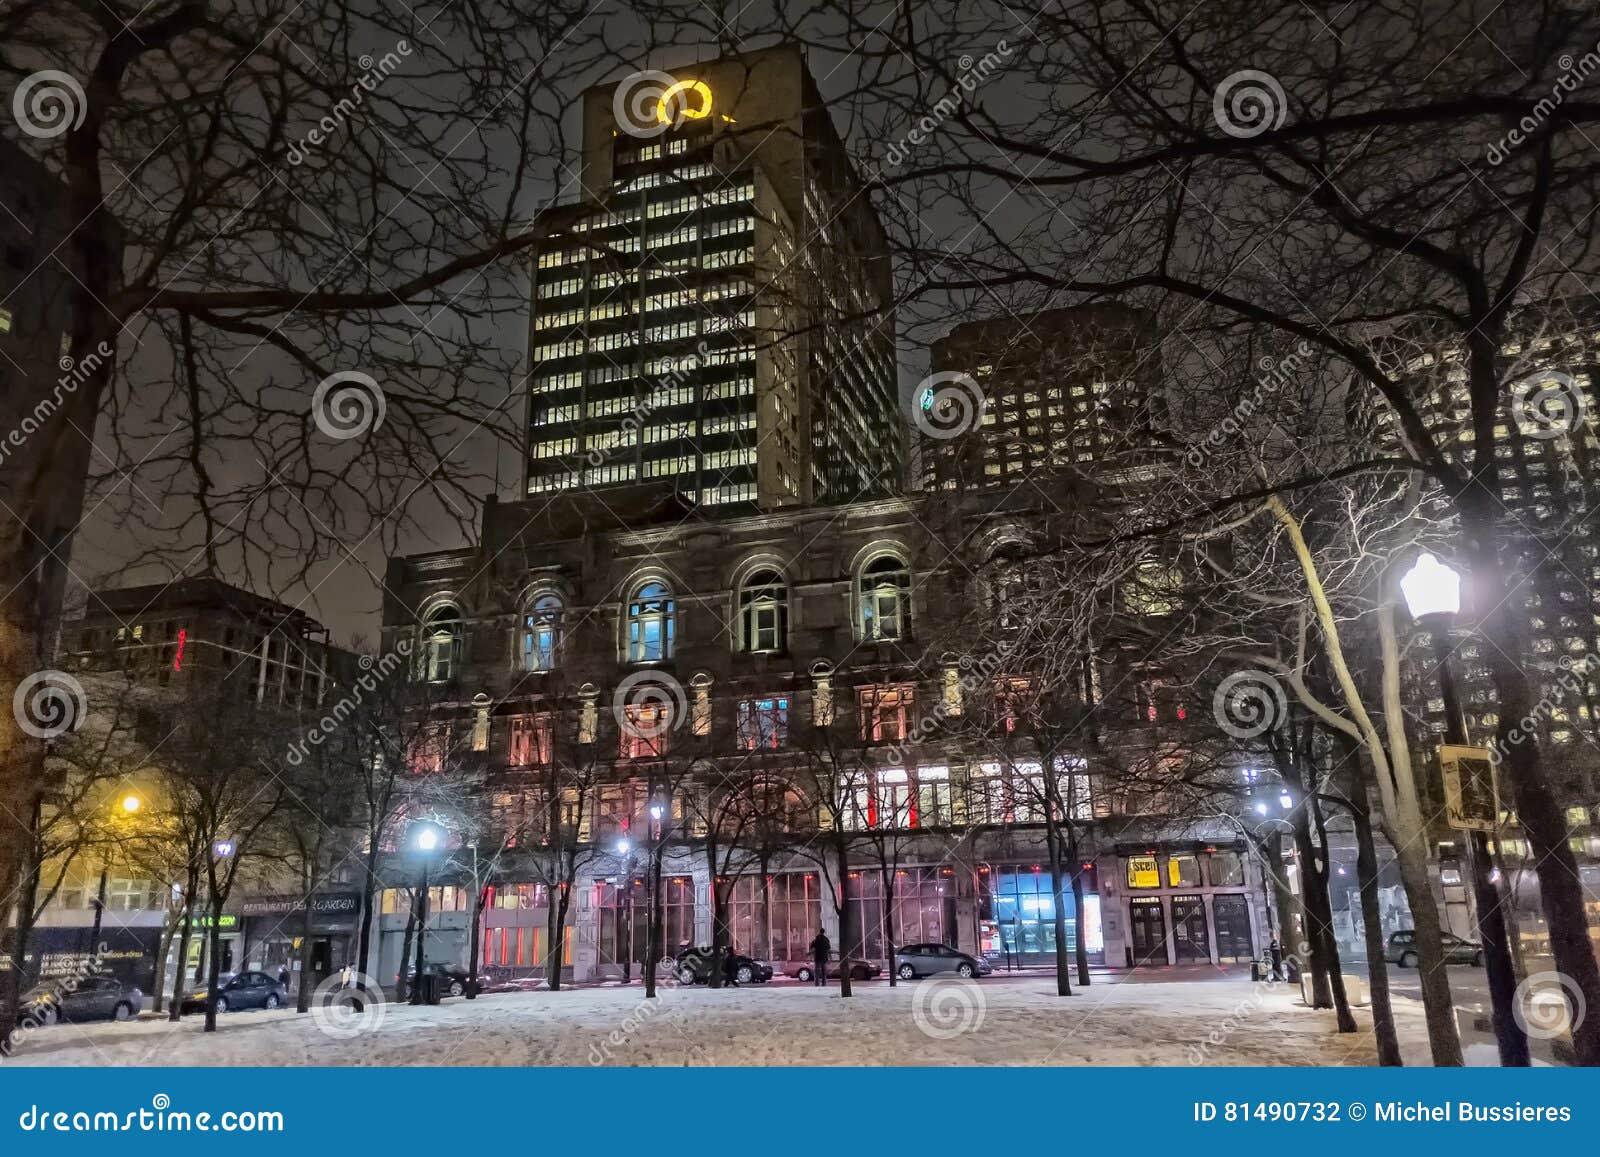 Montreal night scene